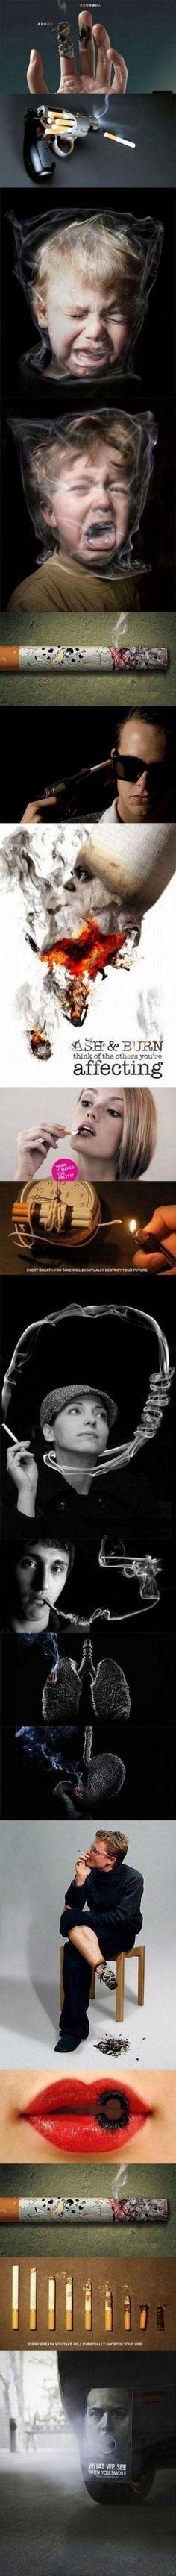 Top Creative Works » Creative AD